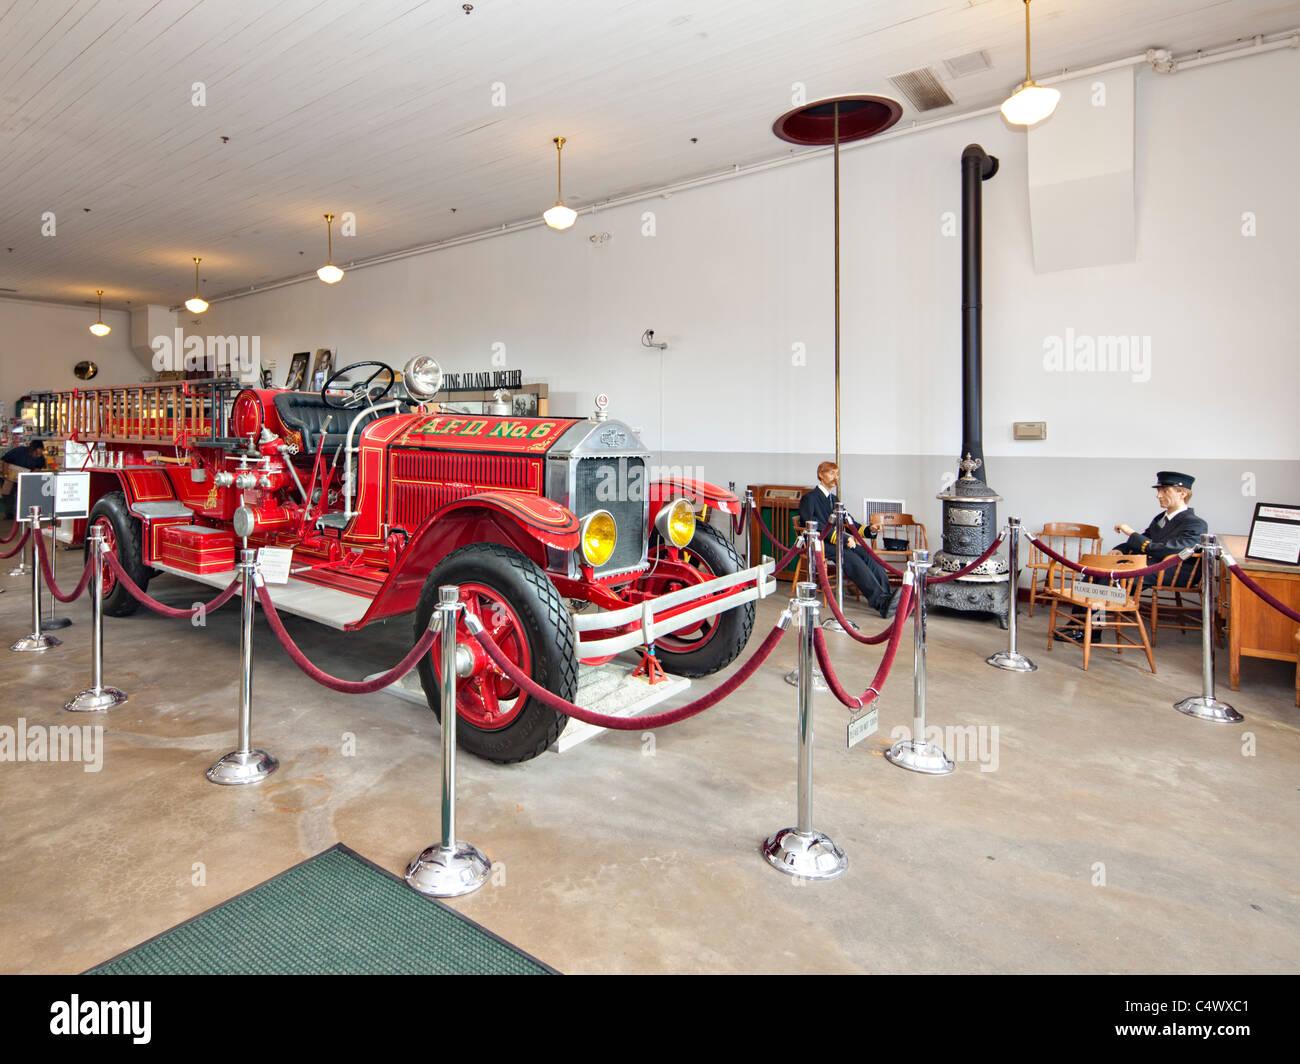 Historic Fire station No. 6, Atlanta - Stock Image